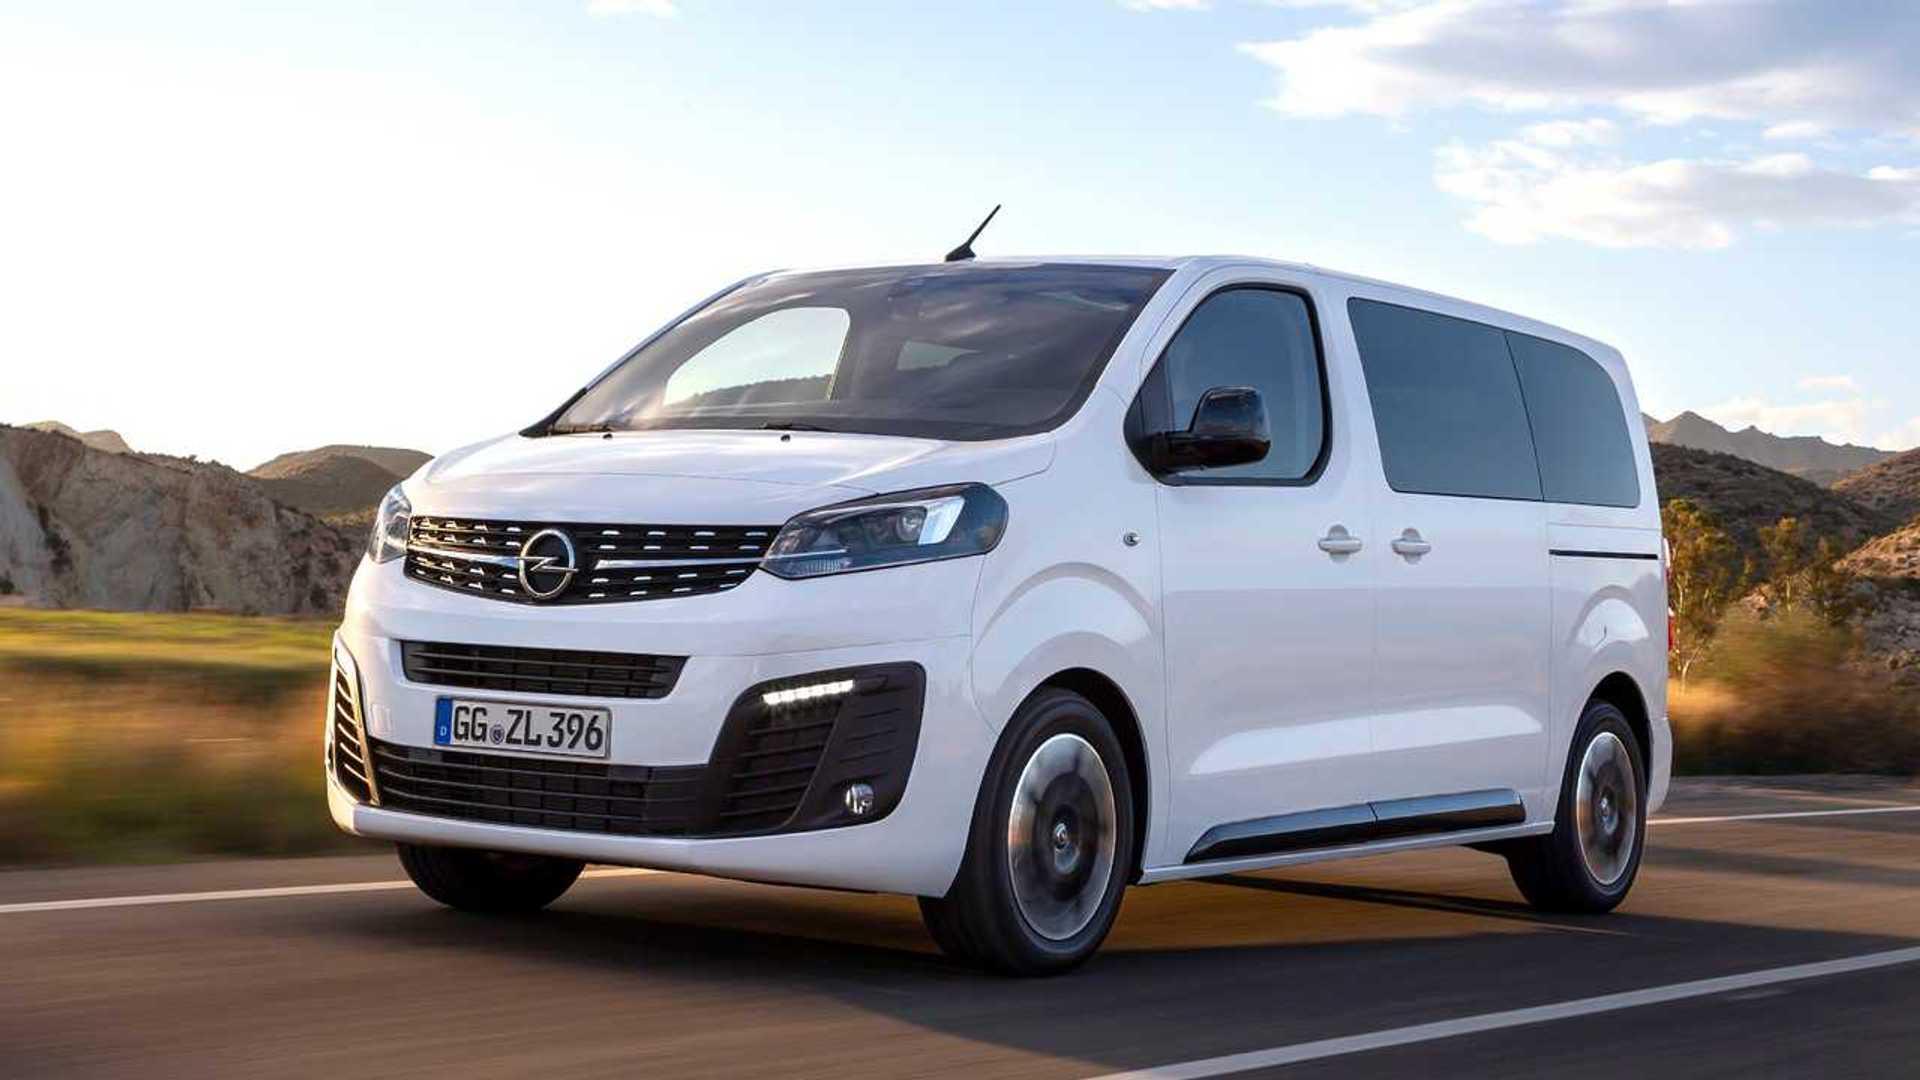 Anteprima Opel Zafira Life al Transpotec